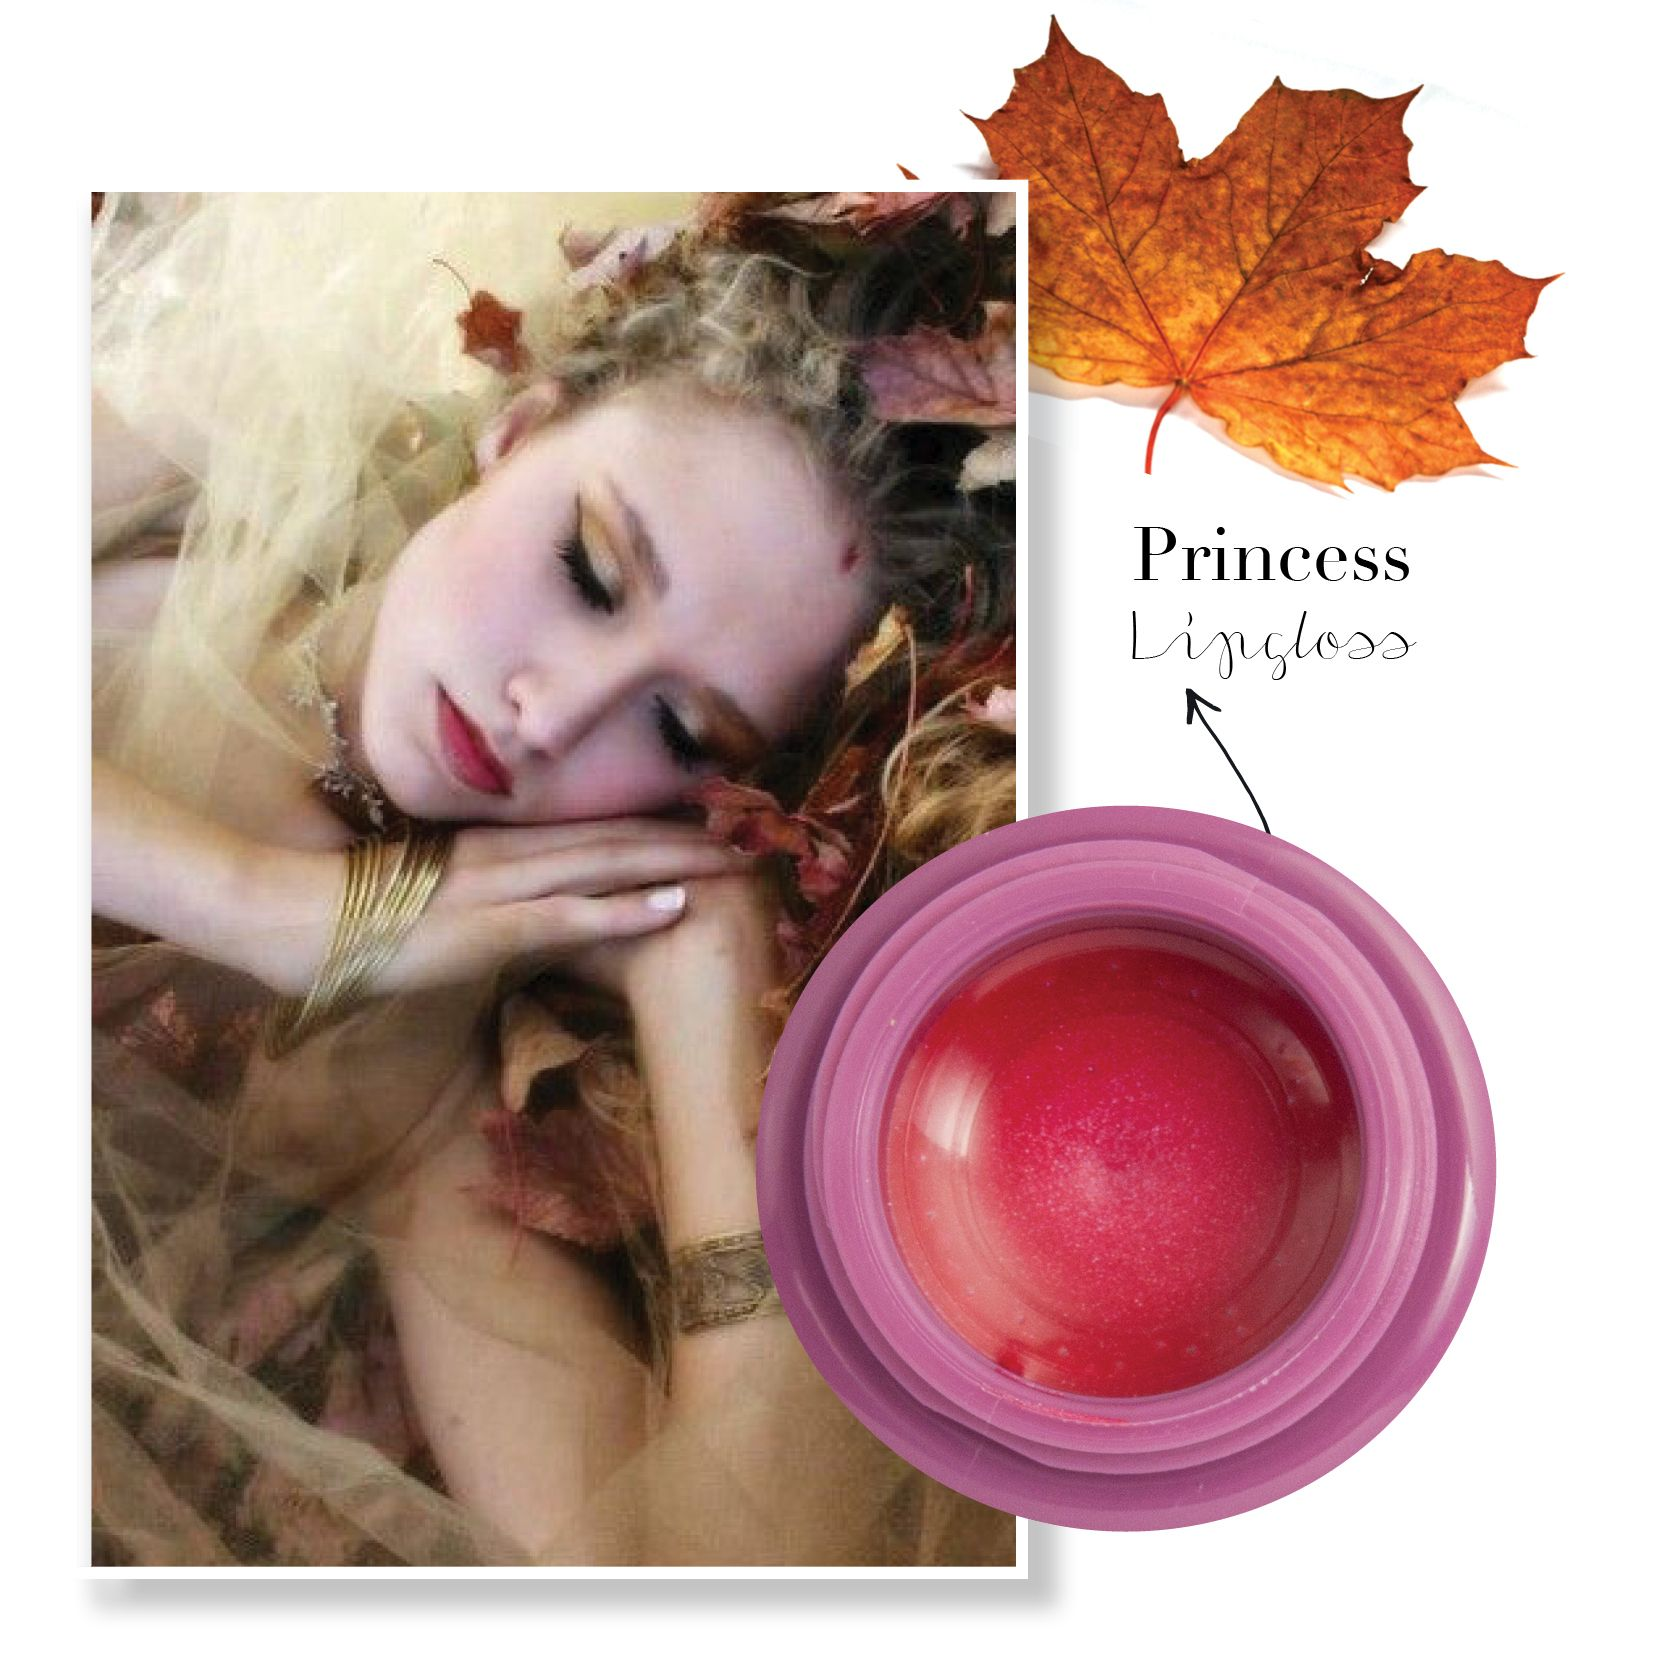 A kiss with Princess will turn any frog into prince charming.. Buy your Princess #lipgloss on our #eshop shop.micaroon.com